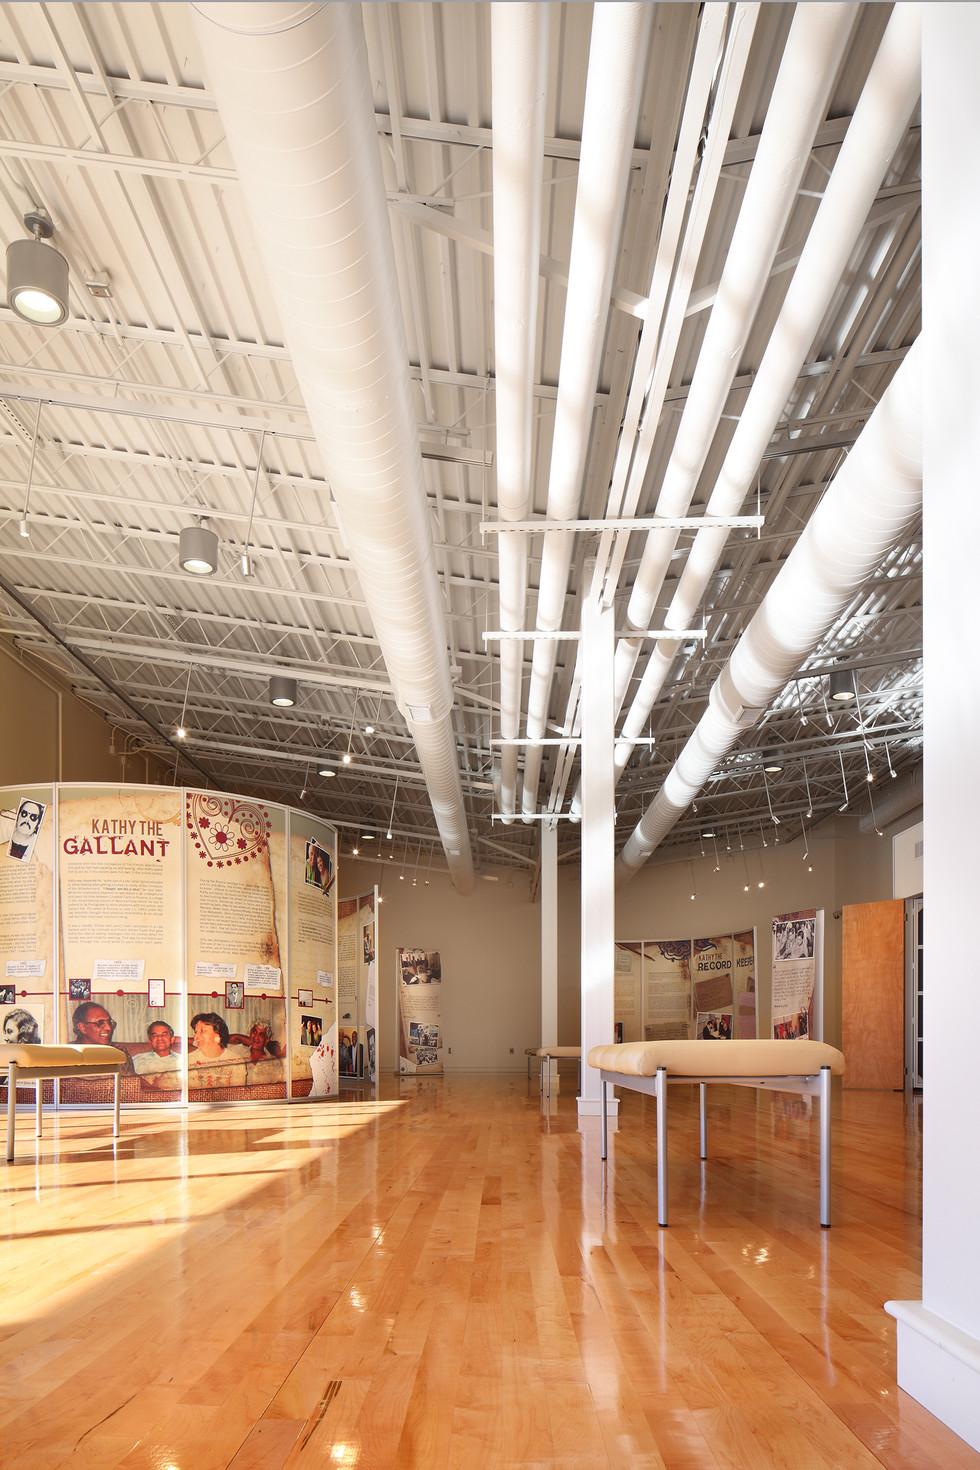 Lyric Theater and Cultural Arts Center, Lexington, KY